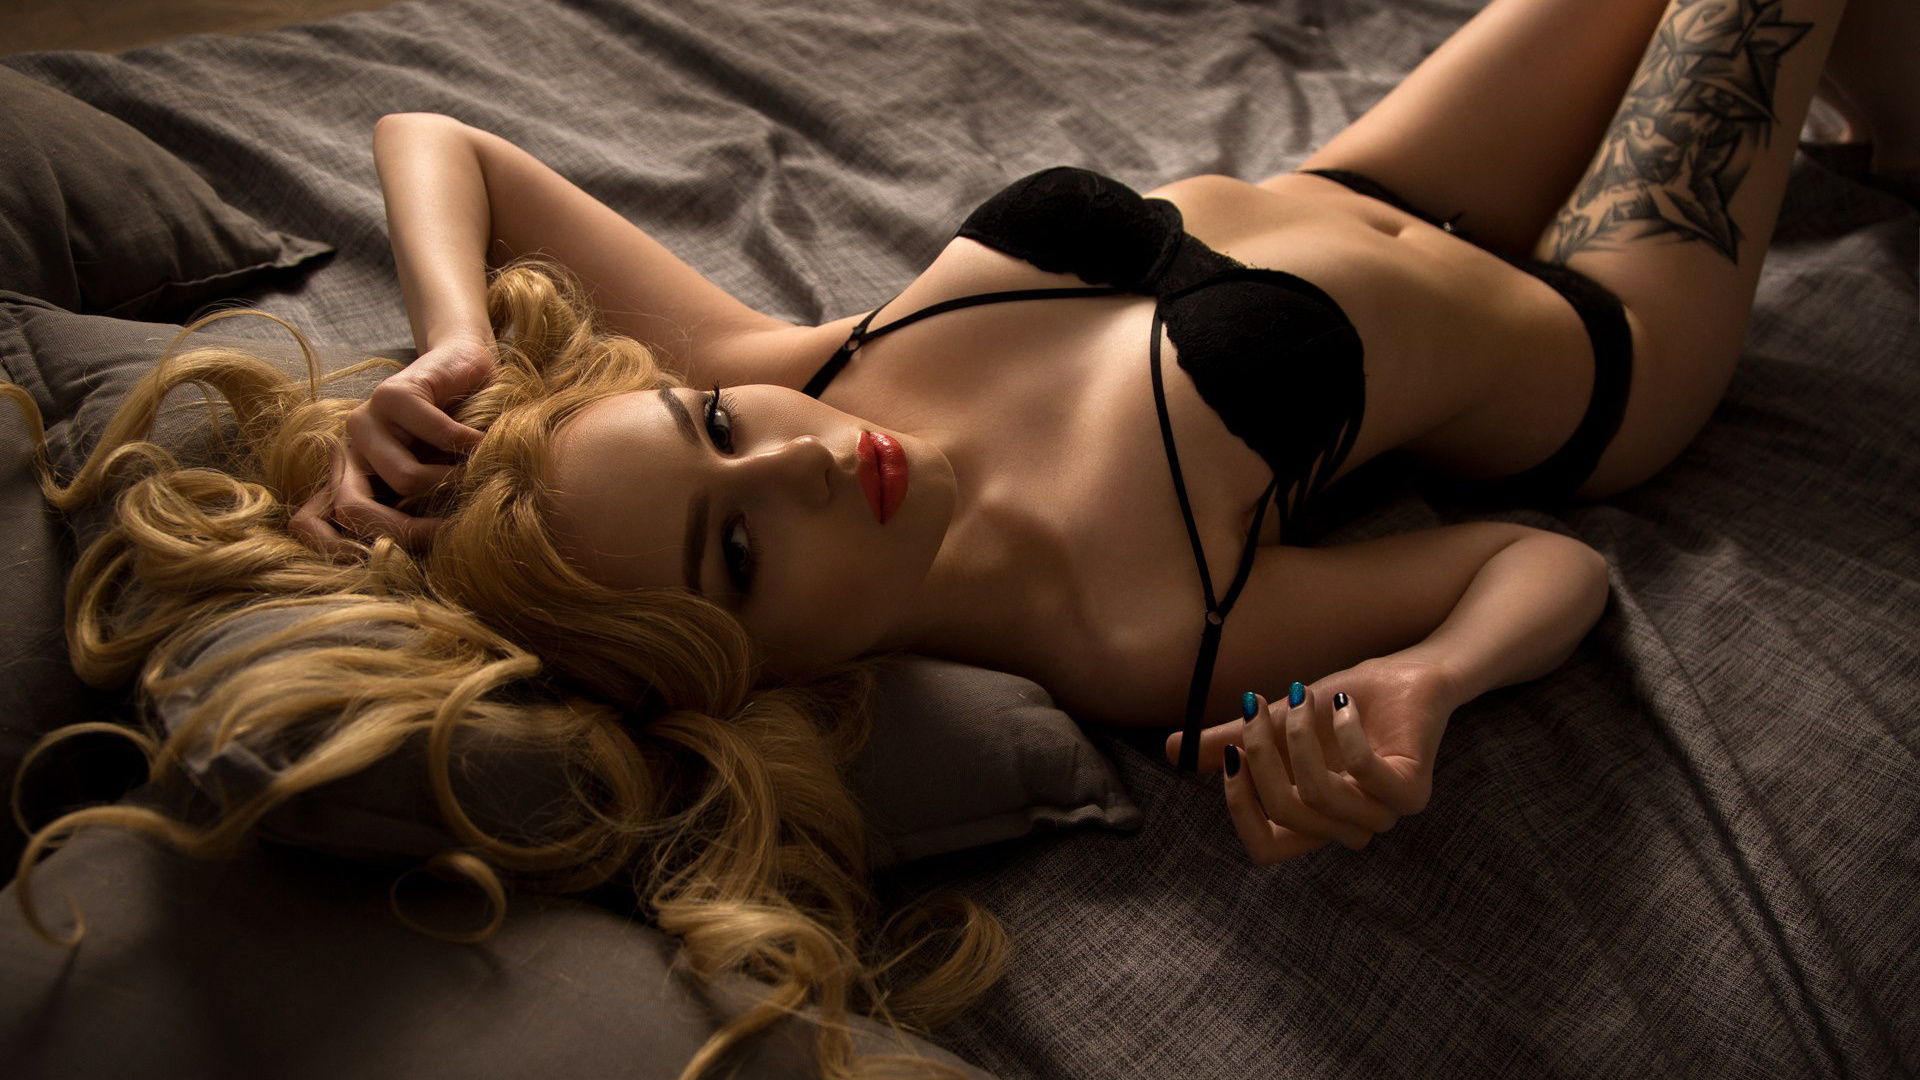 Секси эро девушки, Секси девушки - голые сексуальные девушки и секси 29 фотография